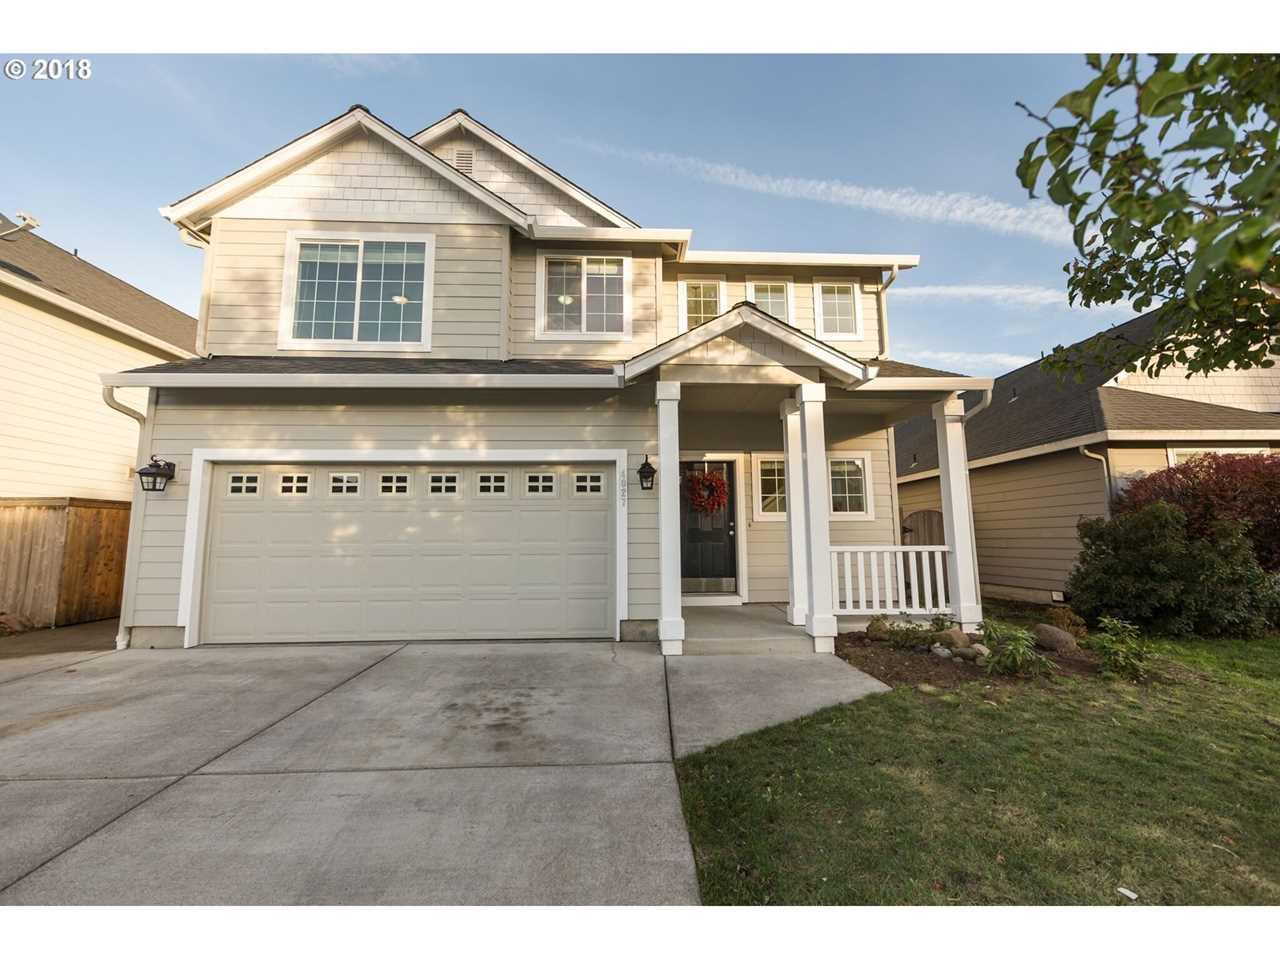 Vancouver Wa Home For Sale 4027 Ne 165th Pl Vancouver Wa Mls 18227910 Springbrook Ridge